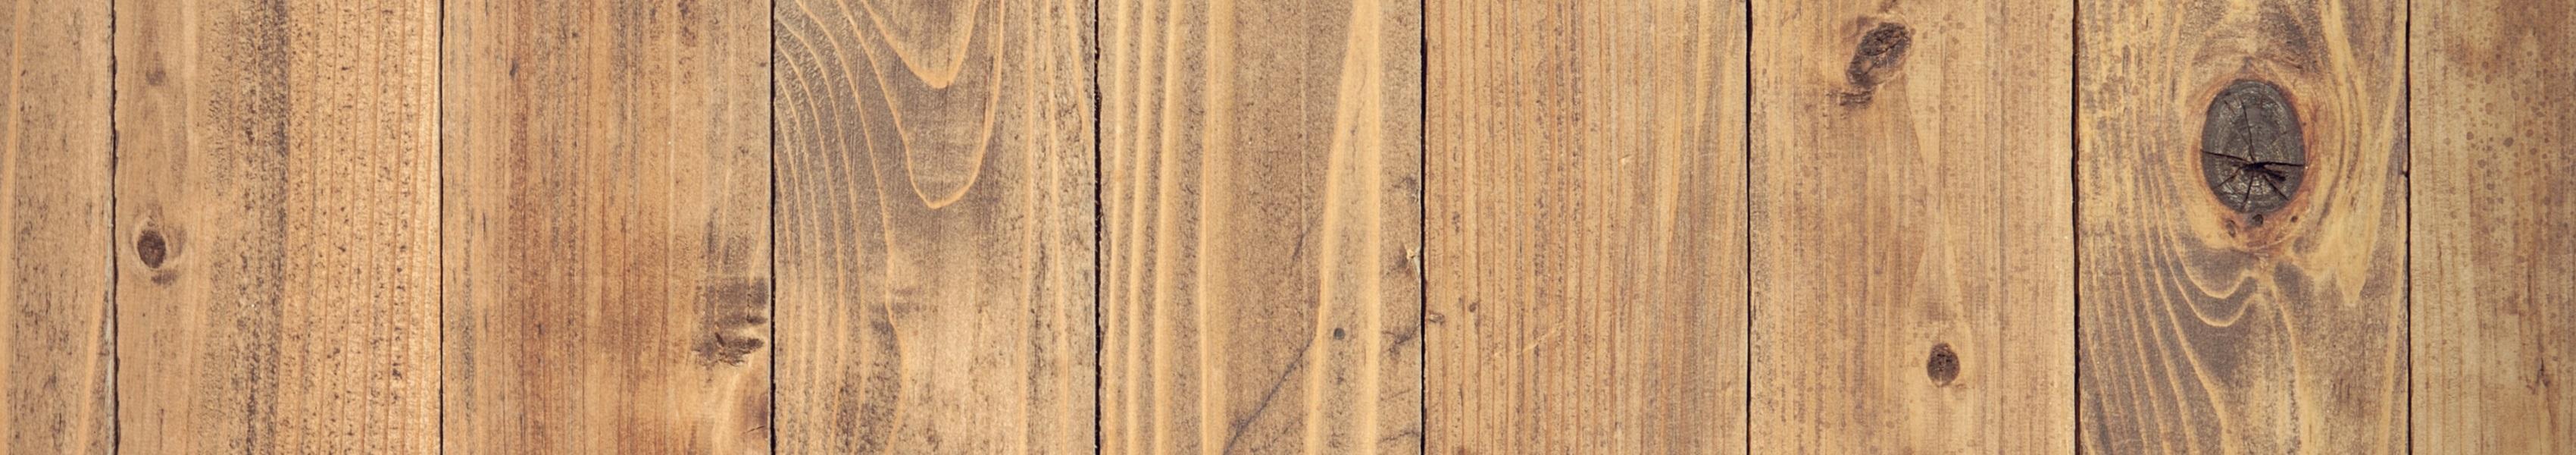 100mm X 35mm (4 X 1.5) Timber